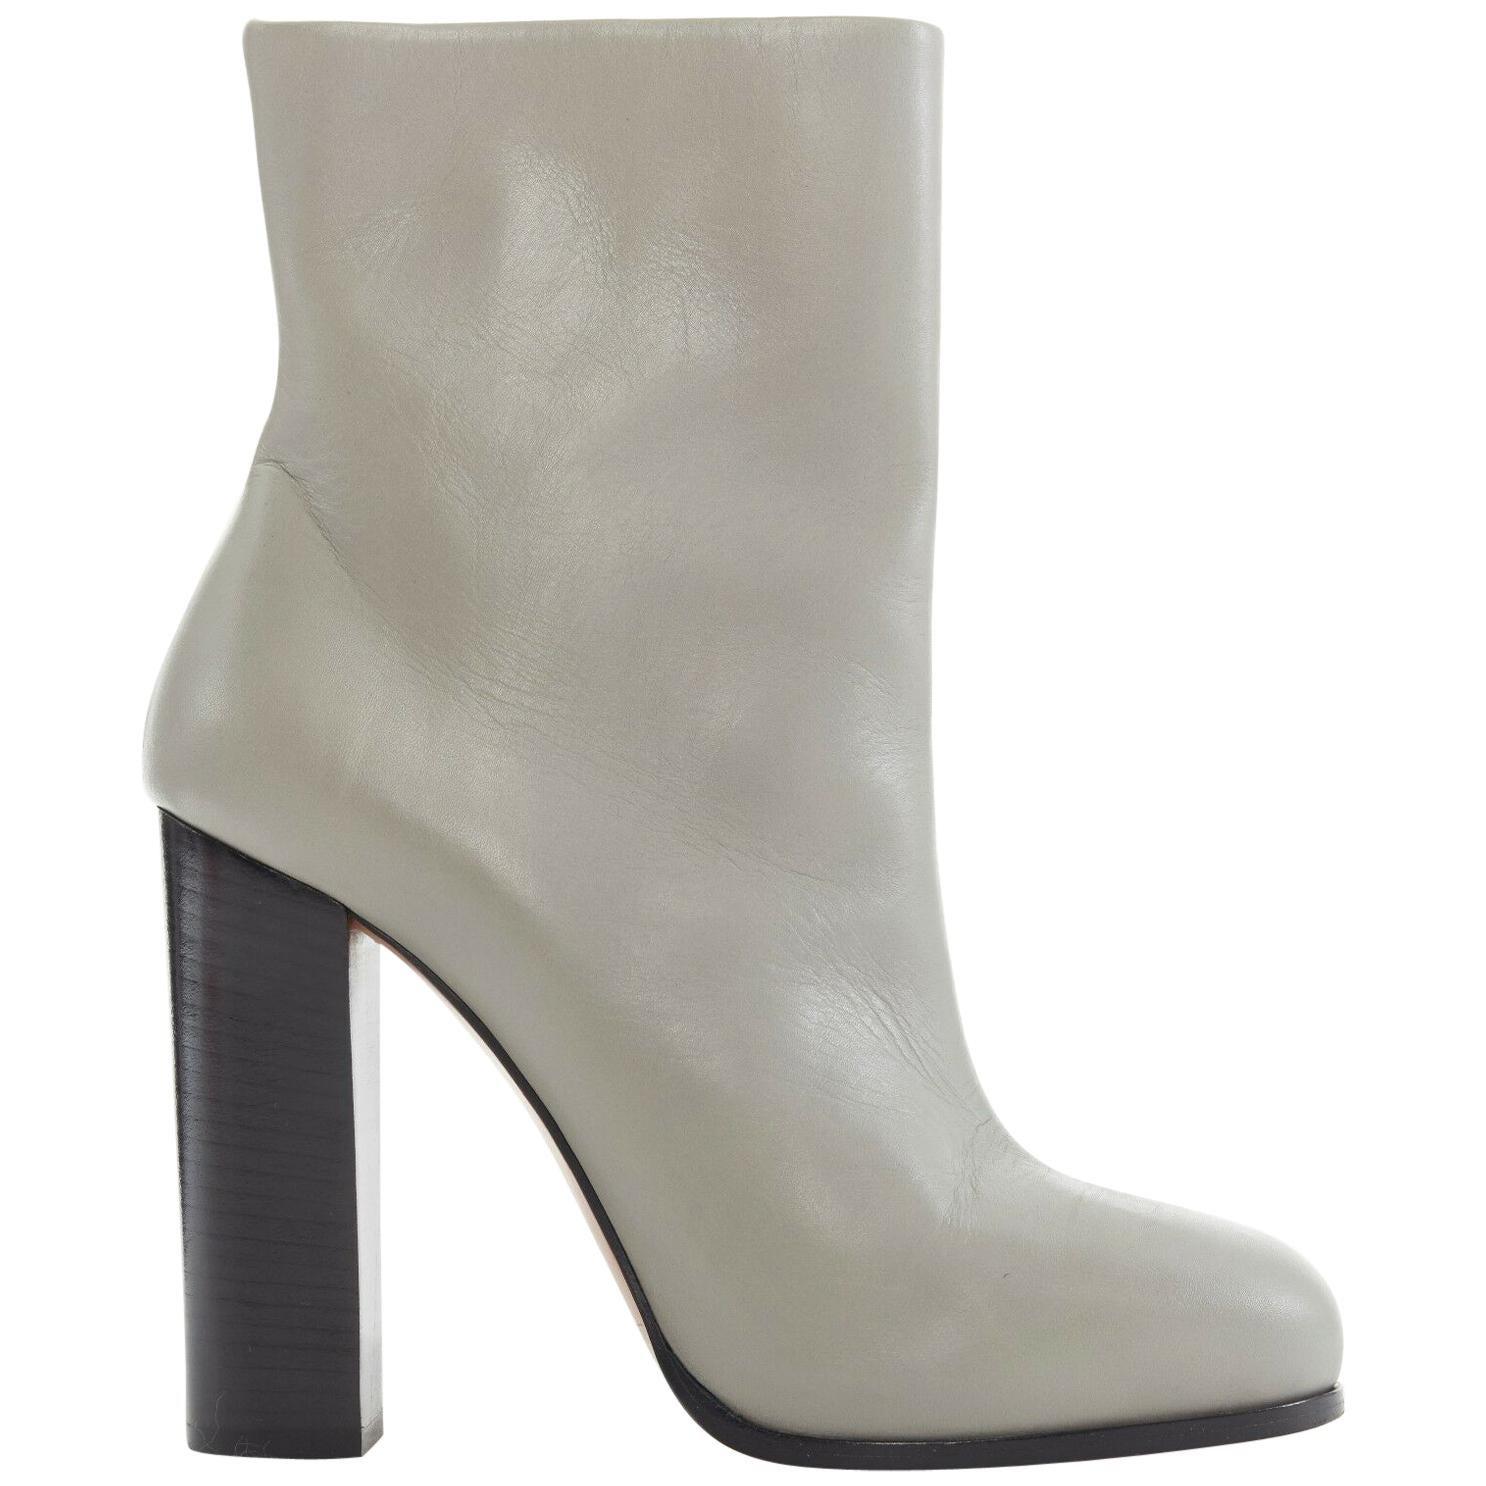 CELINE PHILO light grey leather round toe black block heel ankle boot EU38 US8